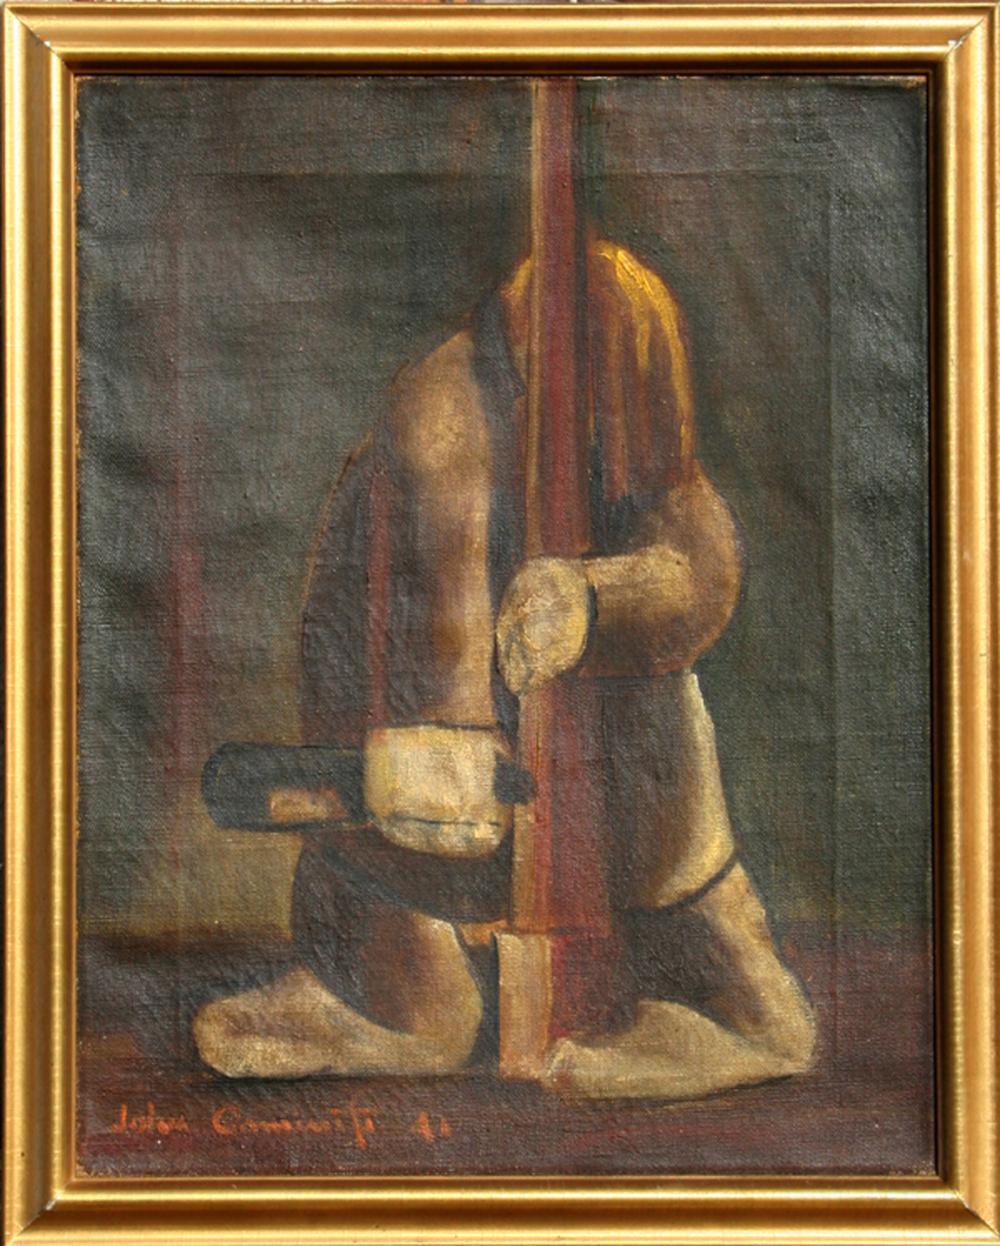 John Caminiti, Man in Coat with Bottle, Oil Painting